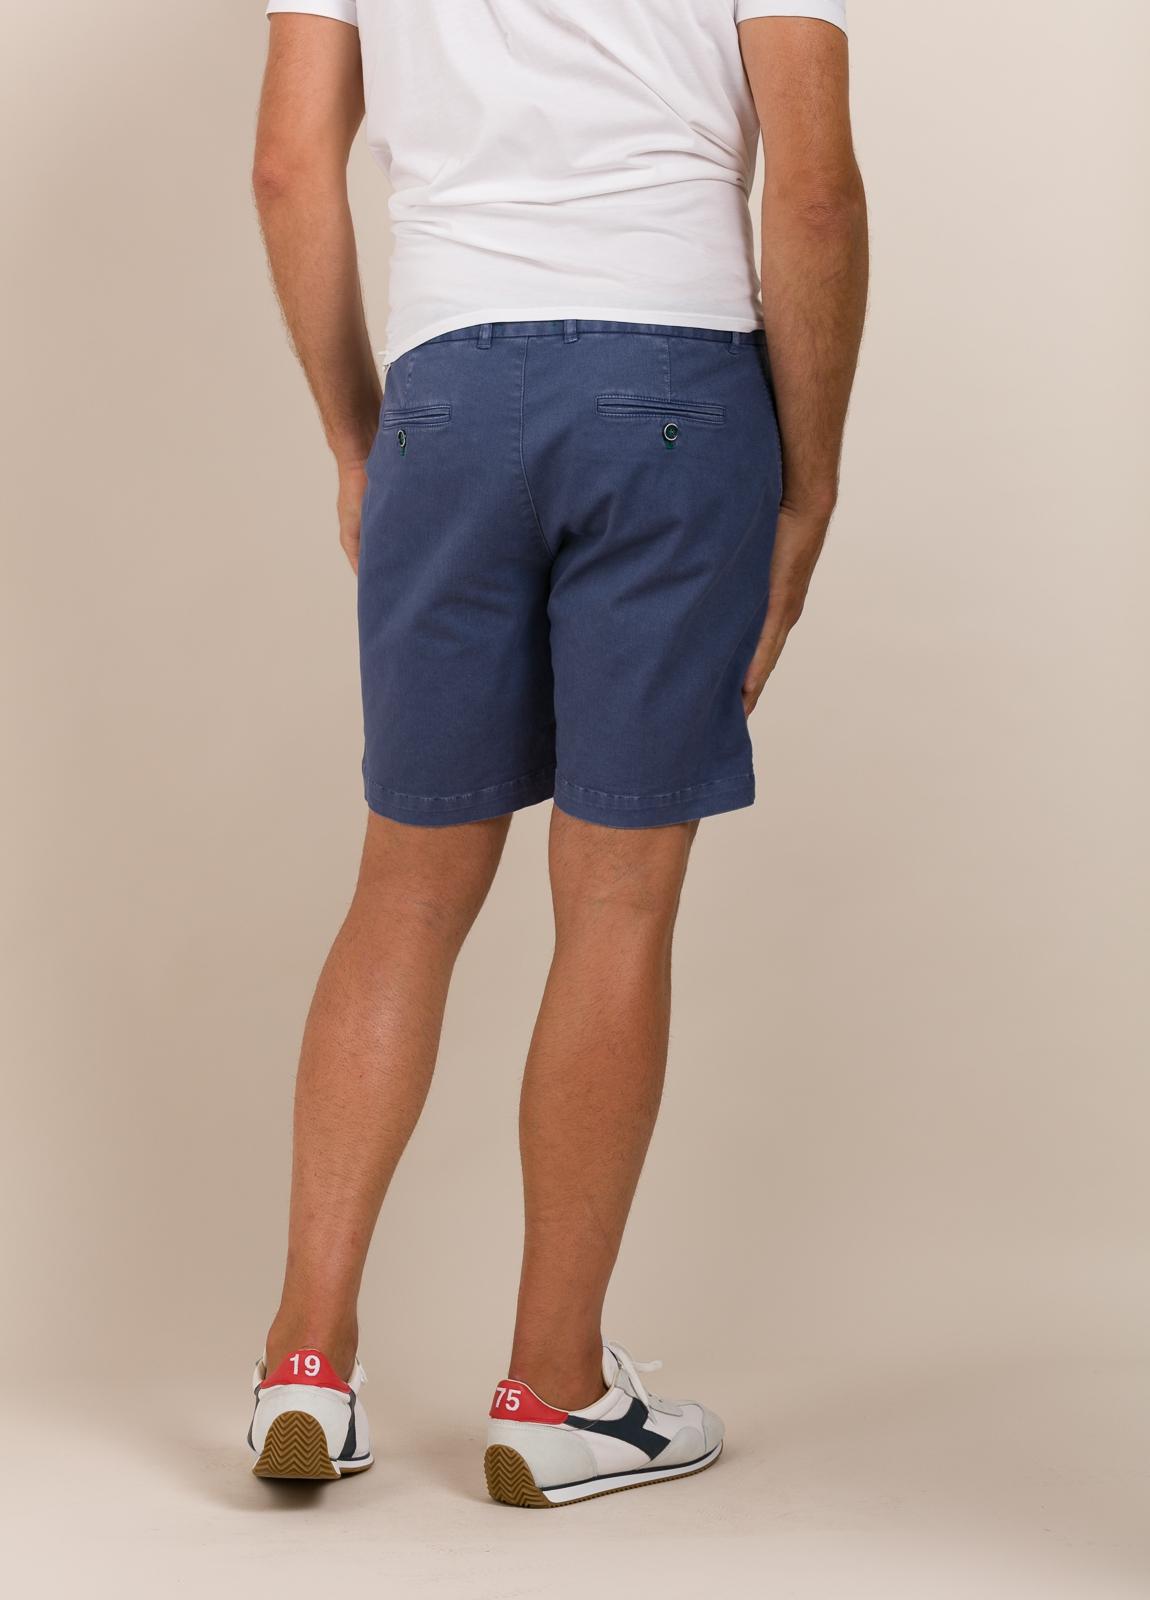 Bermuda modelo THOMAS color azul tinta, 100% Algodón. - Ítem4